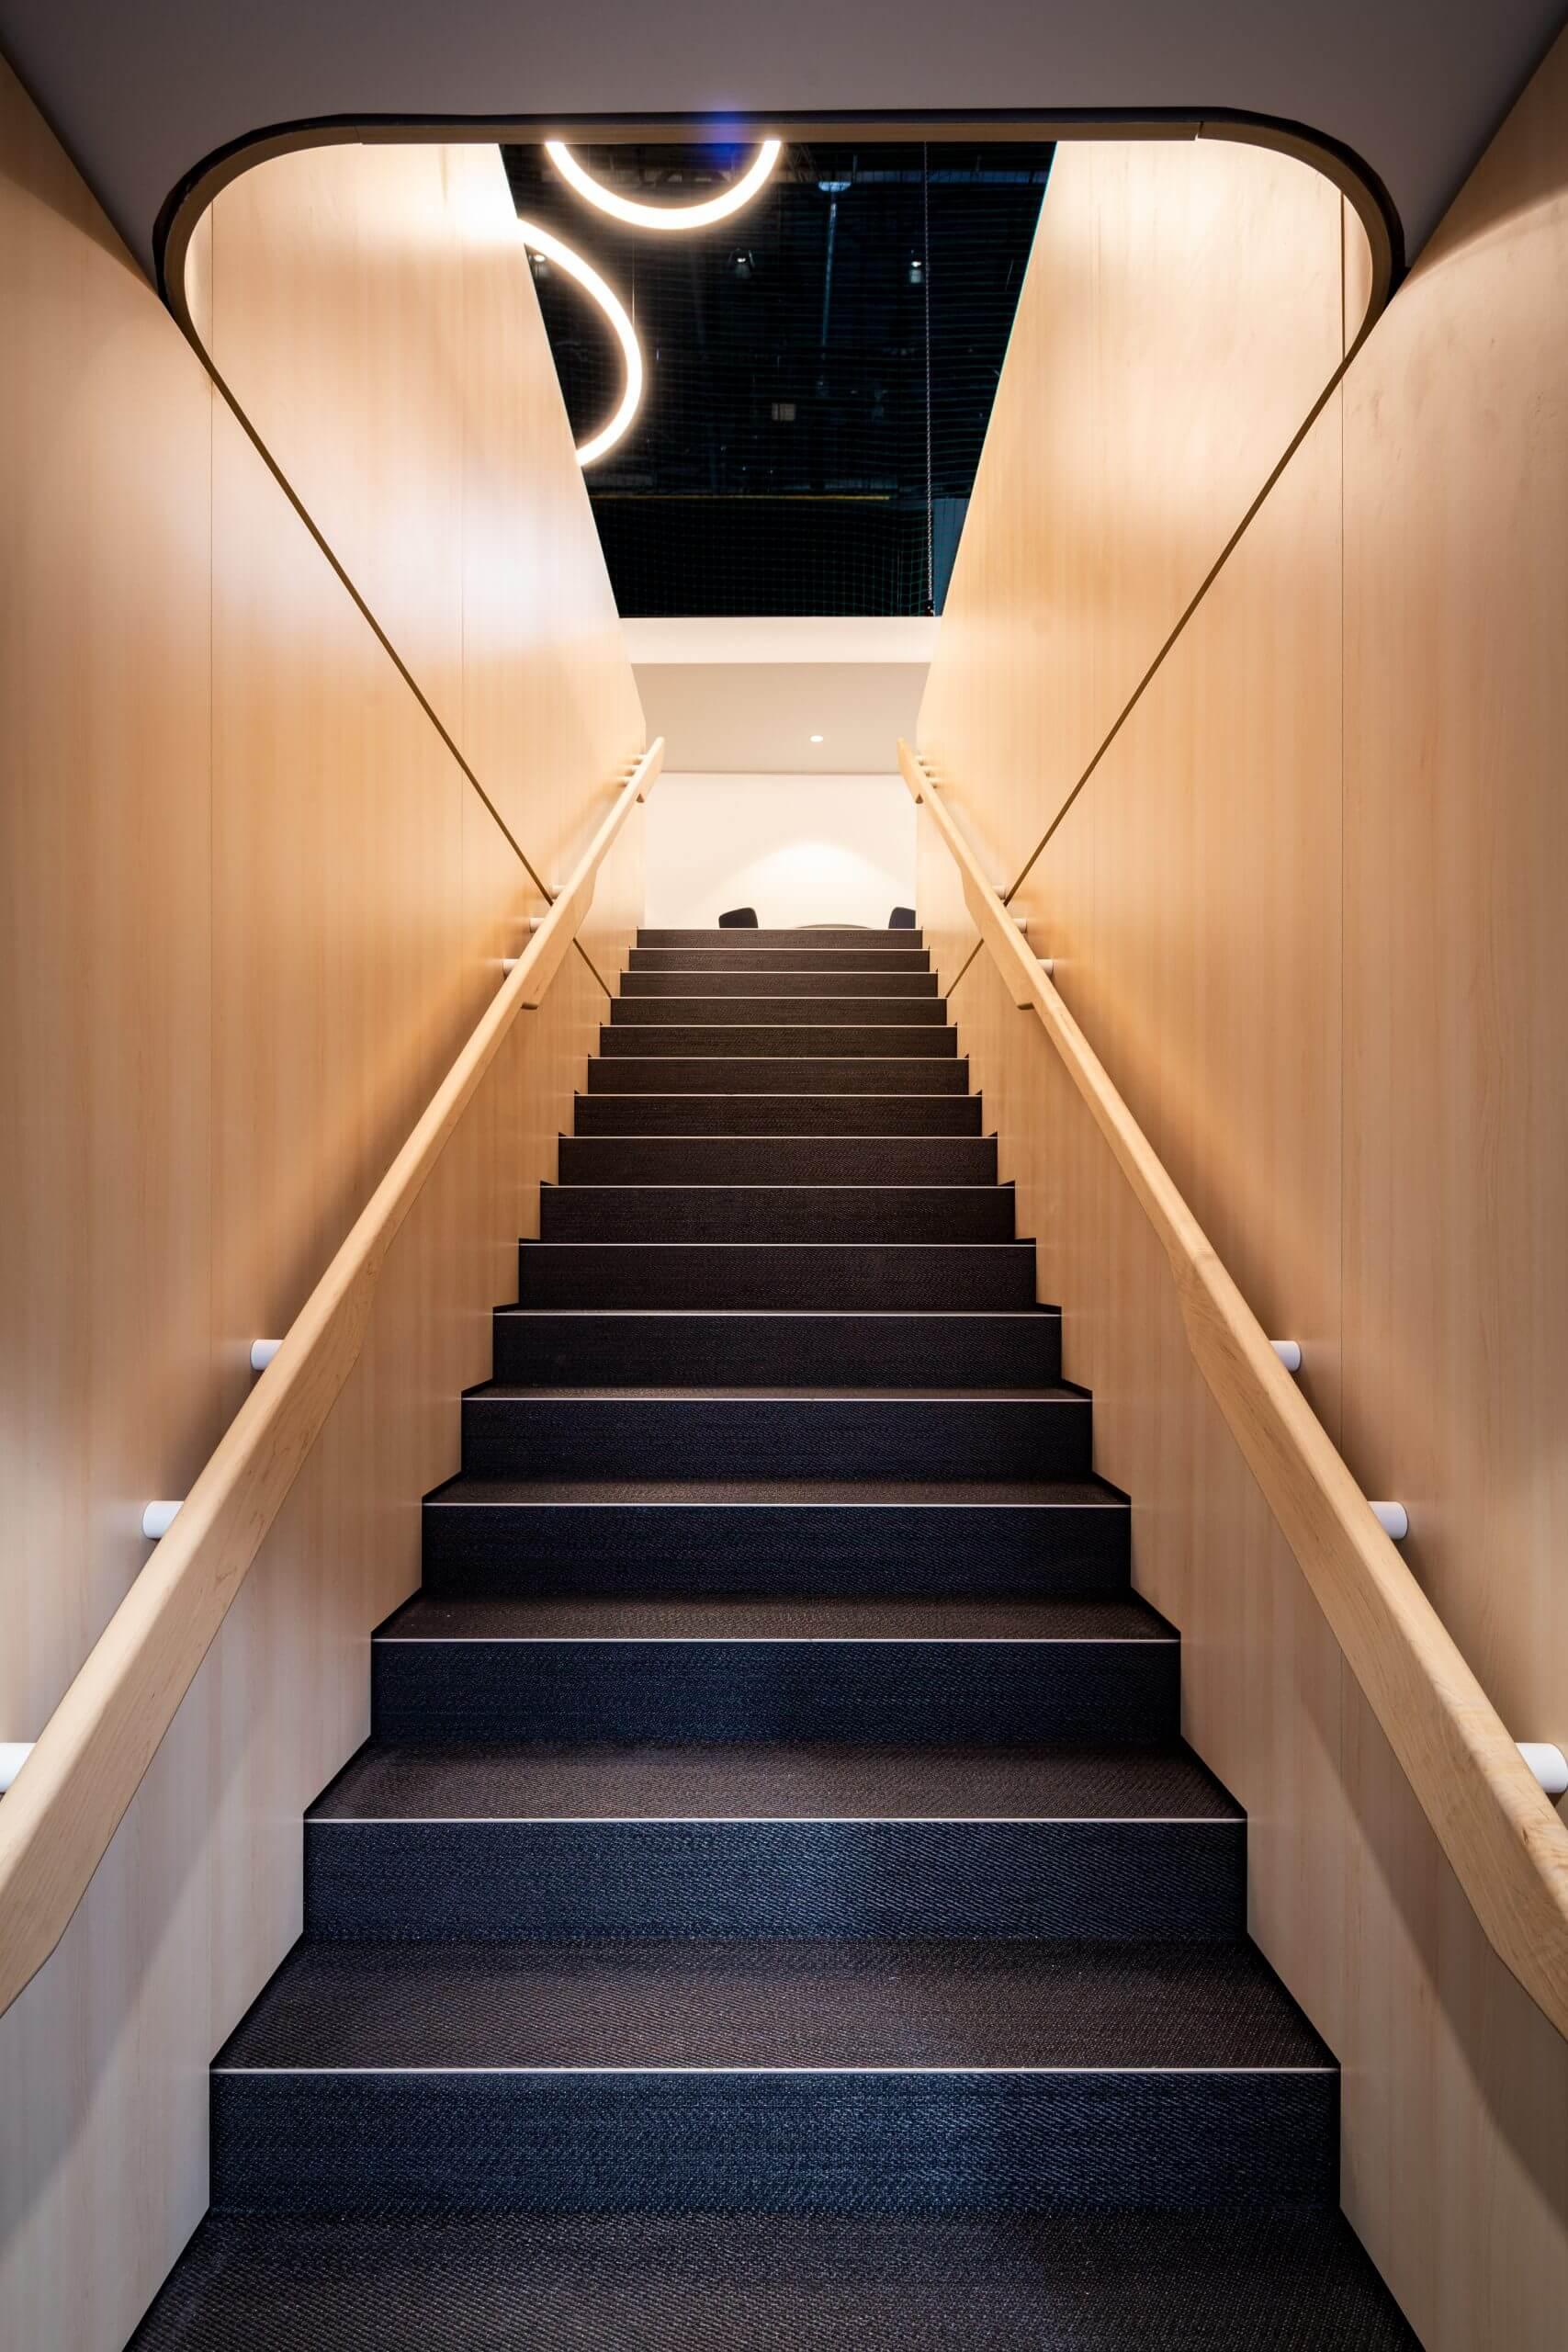 06_HYUNDAI_Photo-Staircase-©Hyundai-Motor-Company